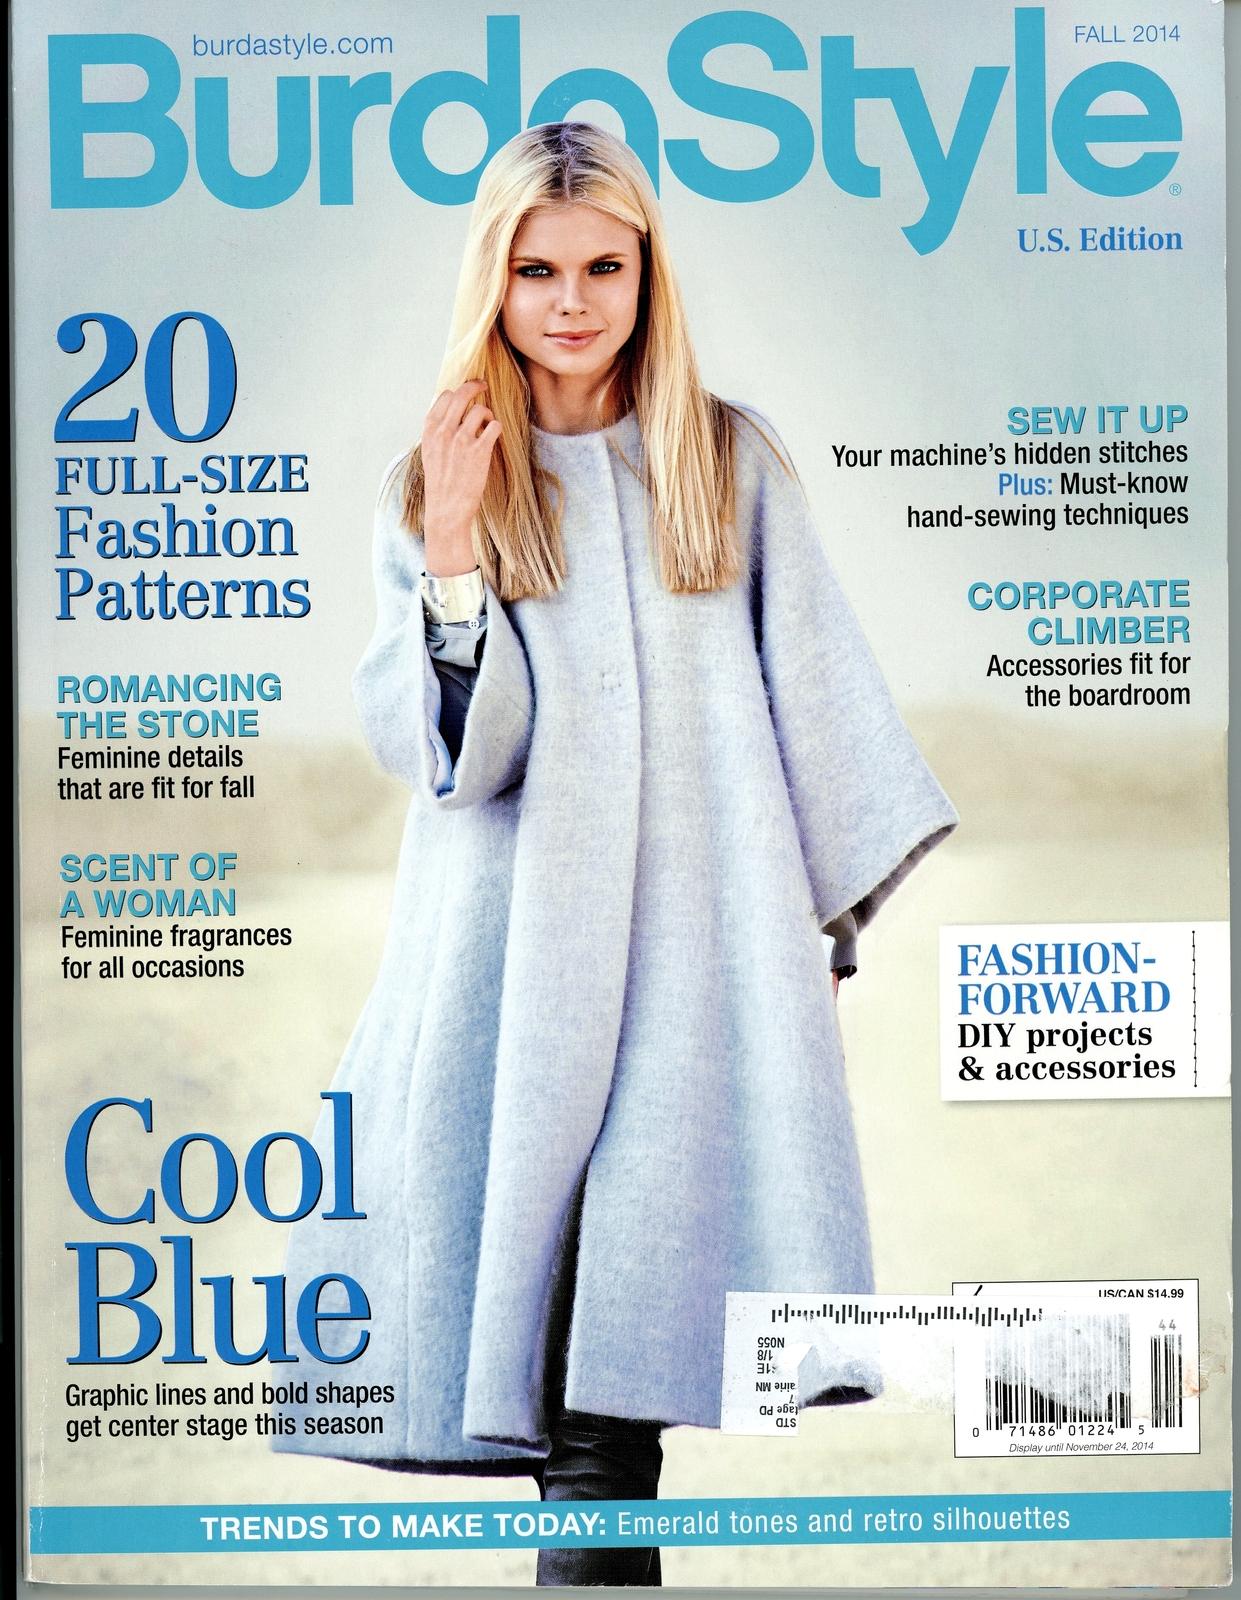 Burda Style Magazine Fall 2014 Us Edition Sewing Fashion Clothing Patterns Magazine Back Issues